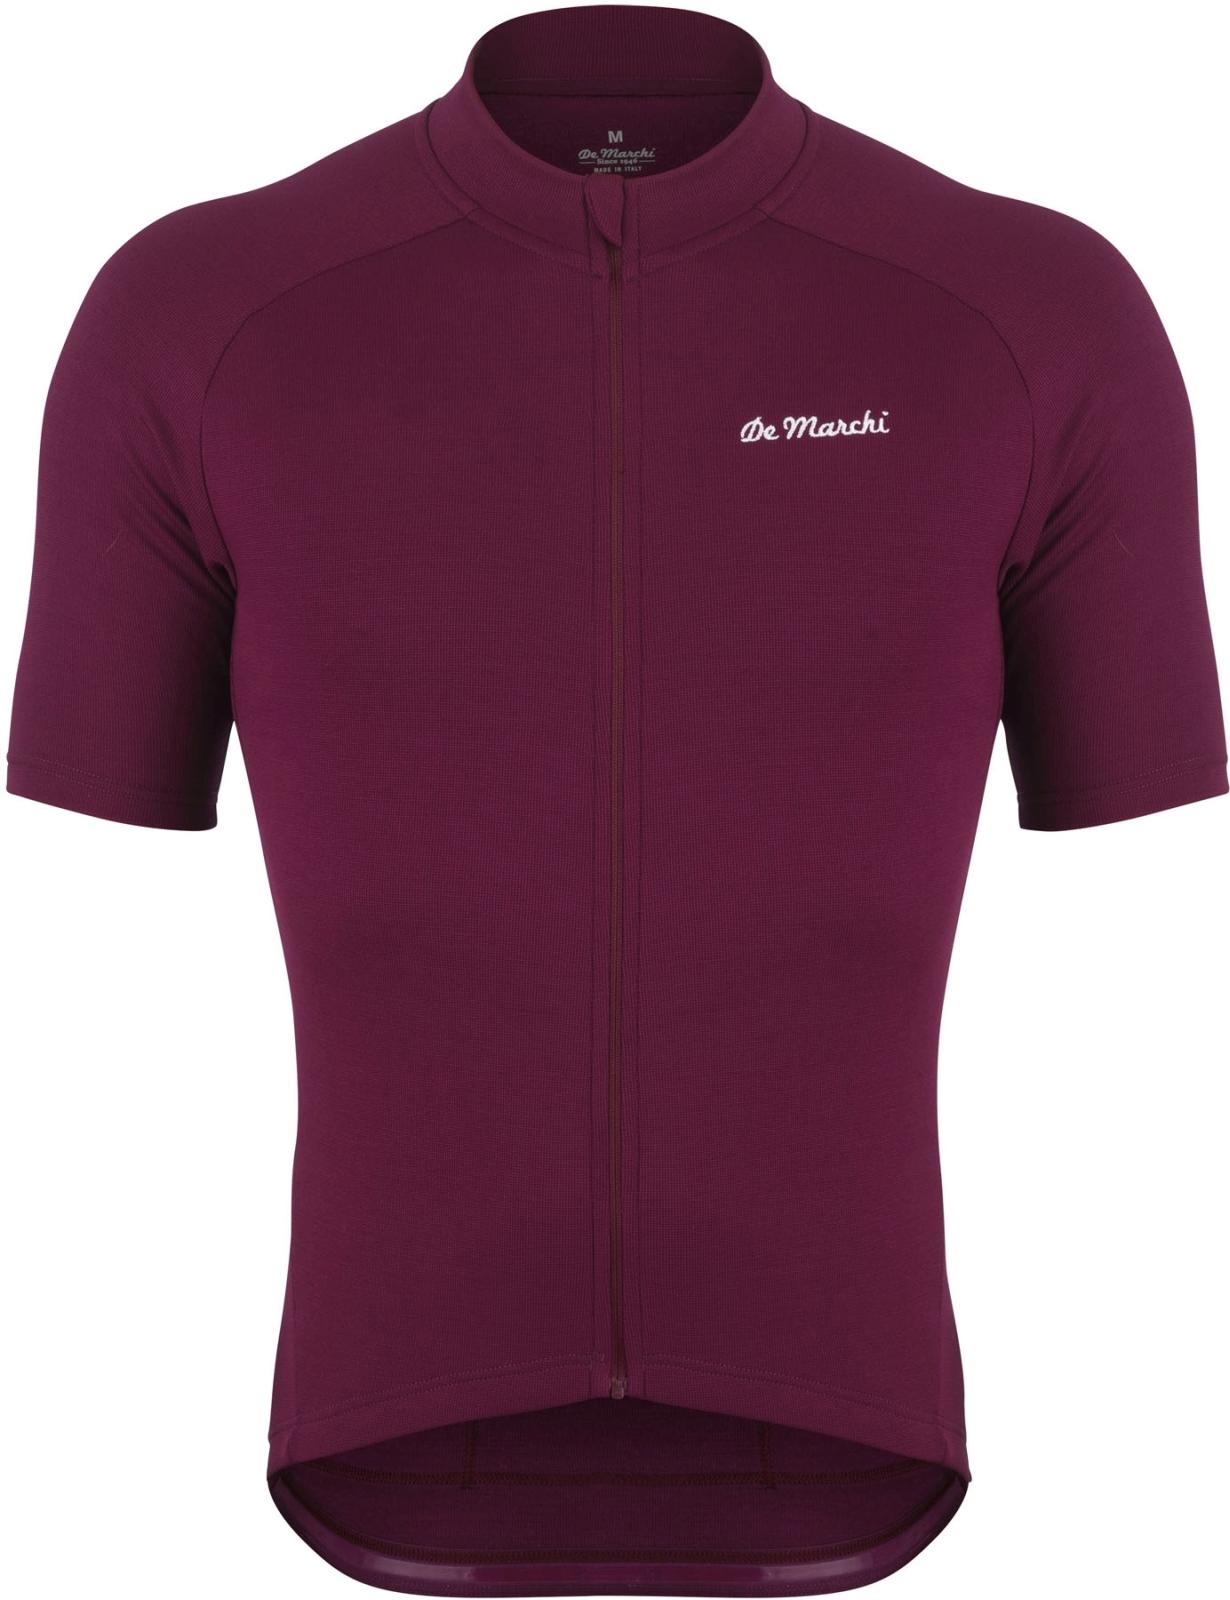 De Marchi Classica Jersey  - purple XL